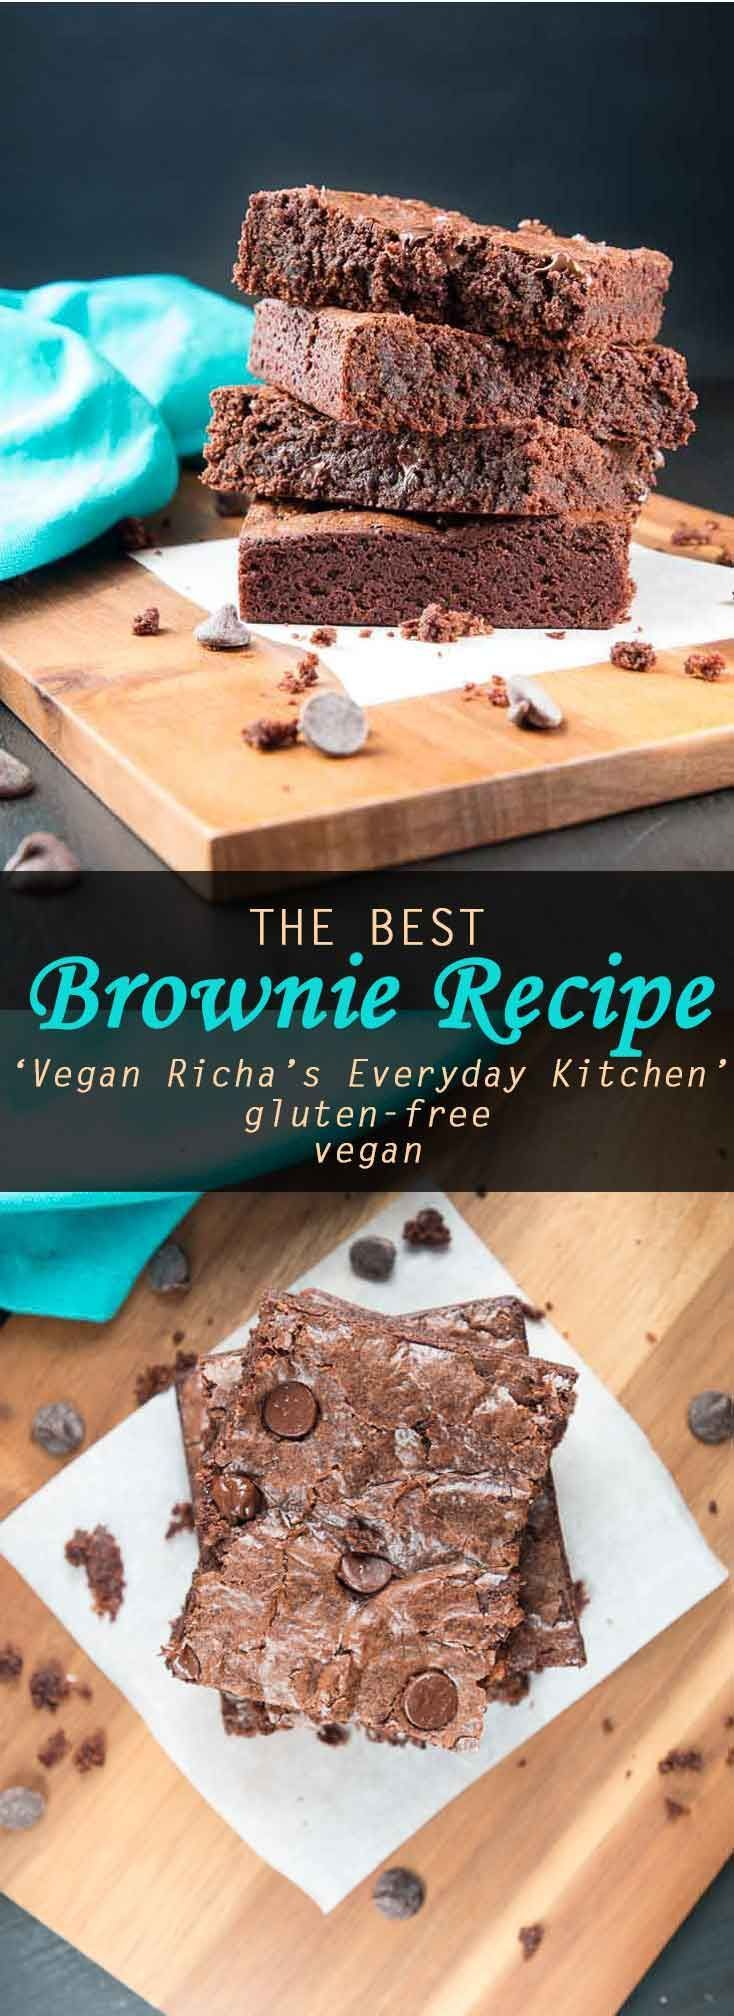 Vegan Brownie Recipe From Vegan Richa S Everyday Kitchen Review Giveaway Vegetarian Gastronomy Recipe Brownie Recipes Vegan Sweets Treats Vegan Brownies Recipe